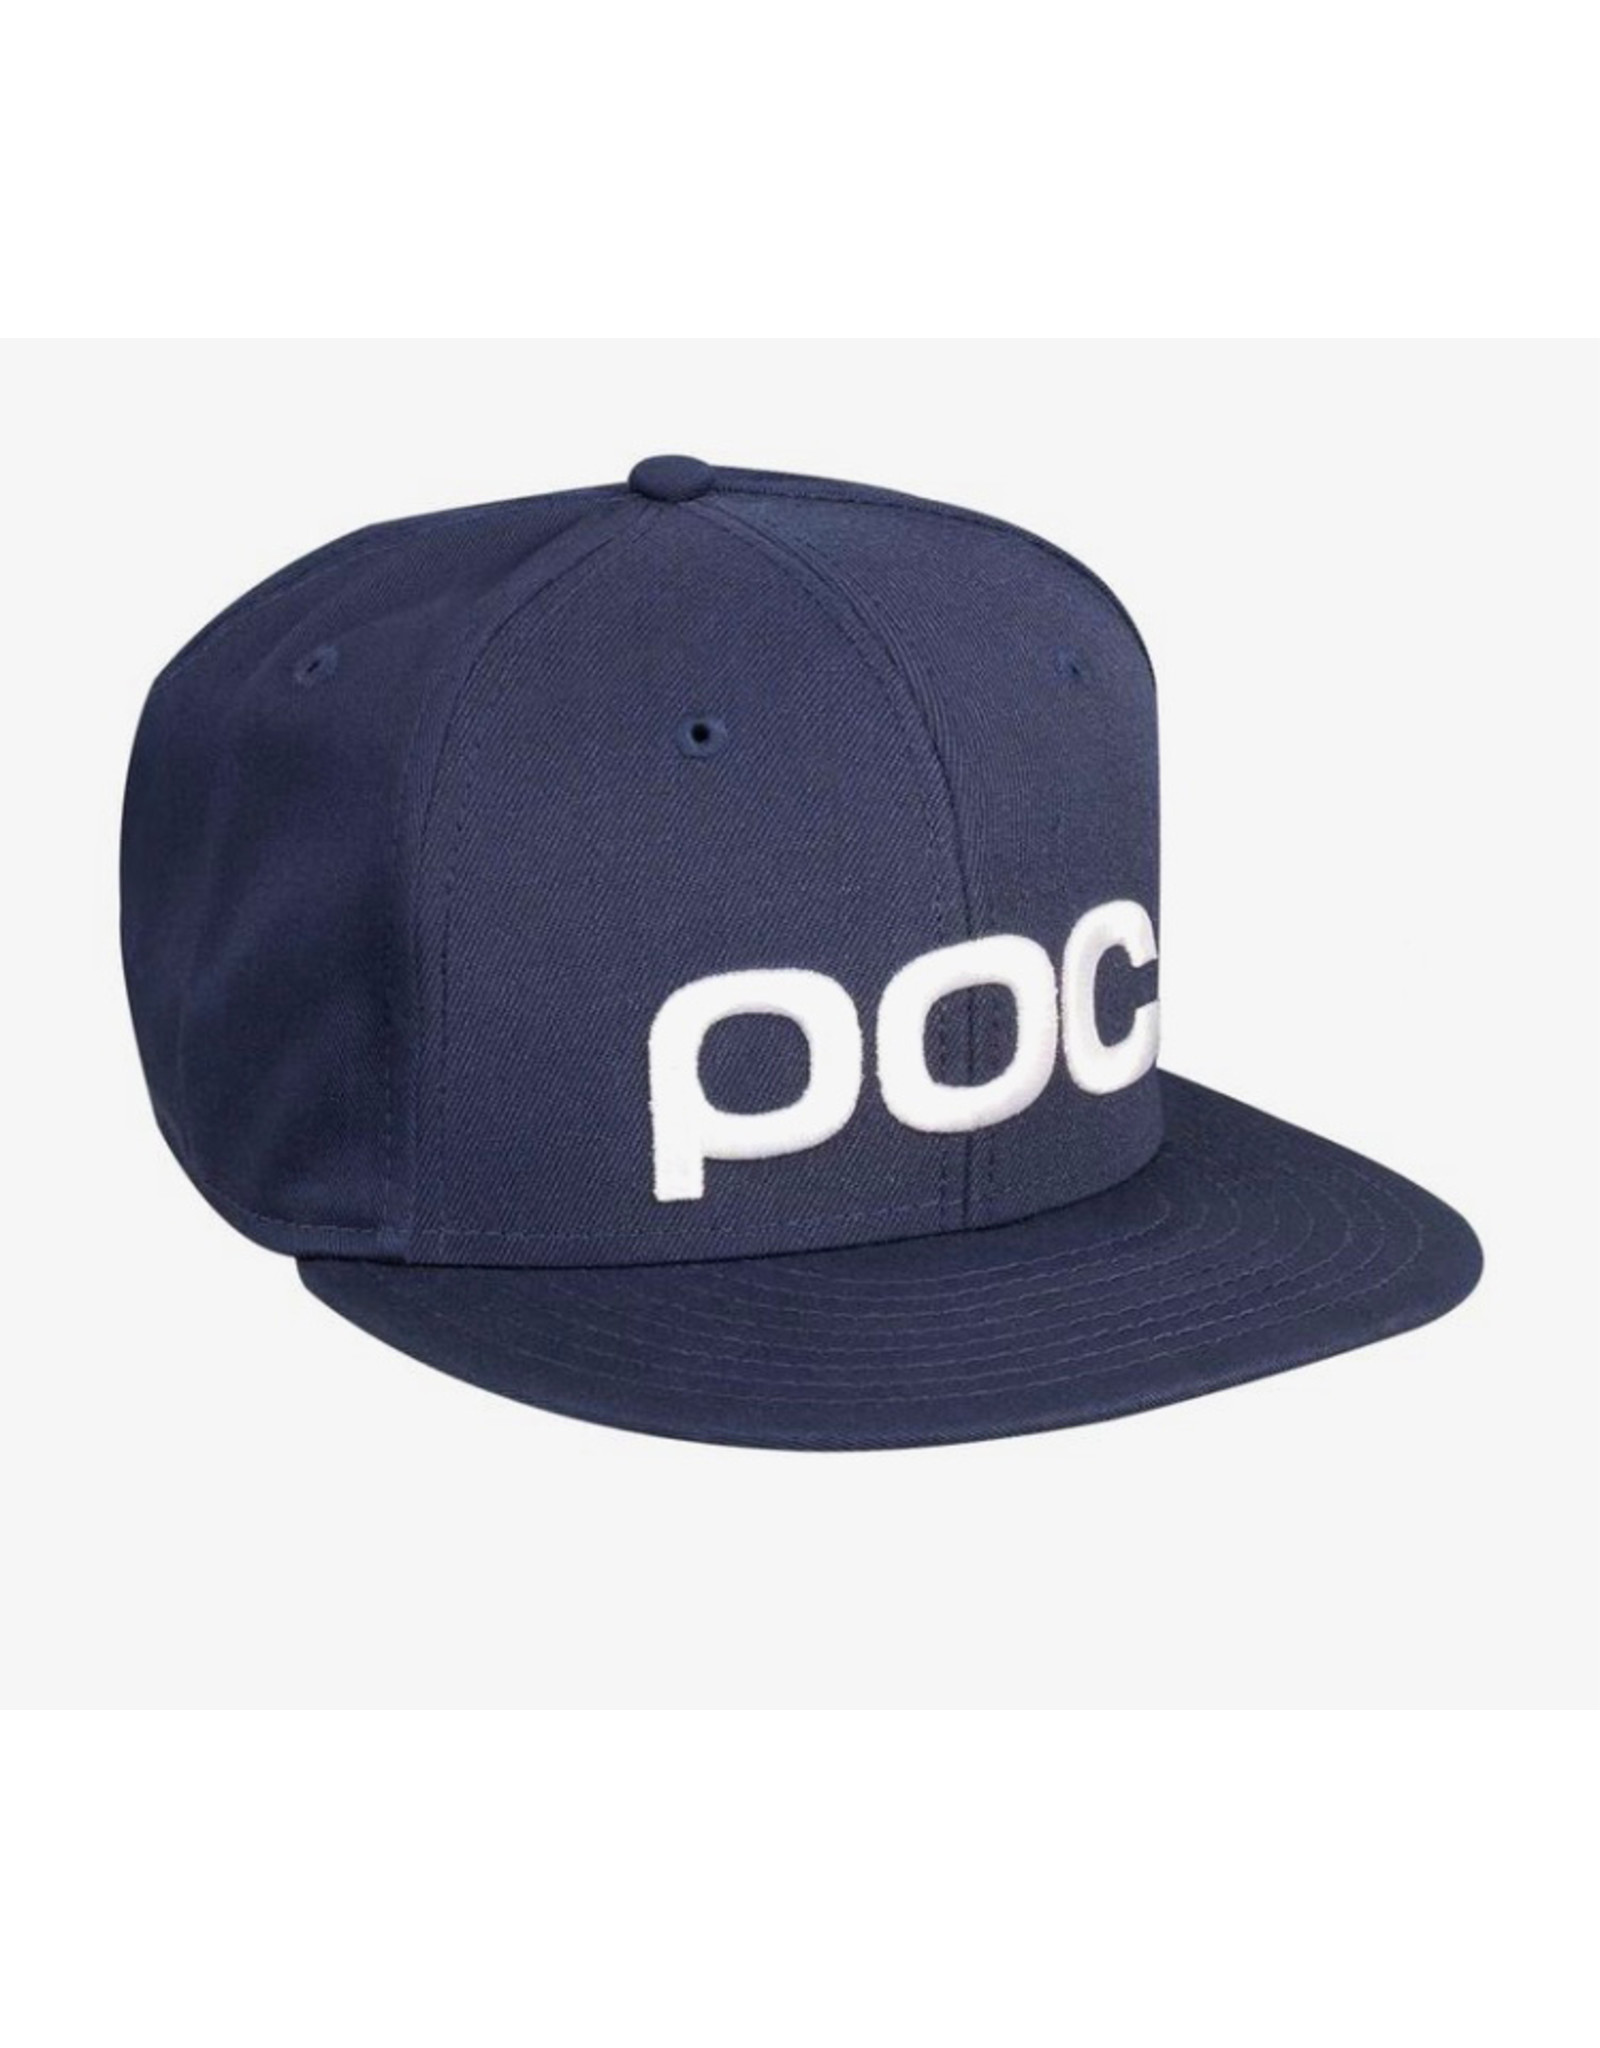 POC POC Corp Cap  Dubnium Blue